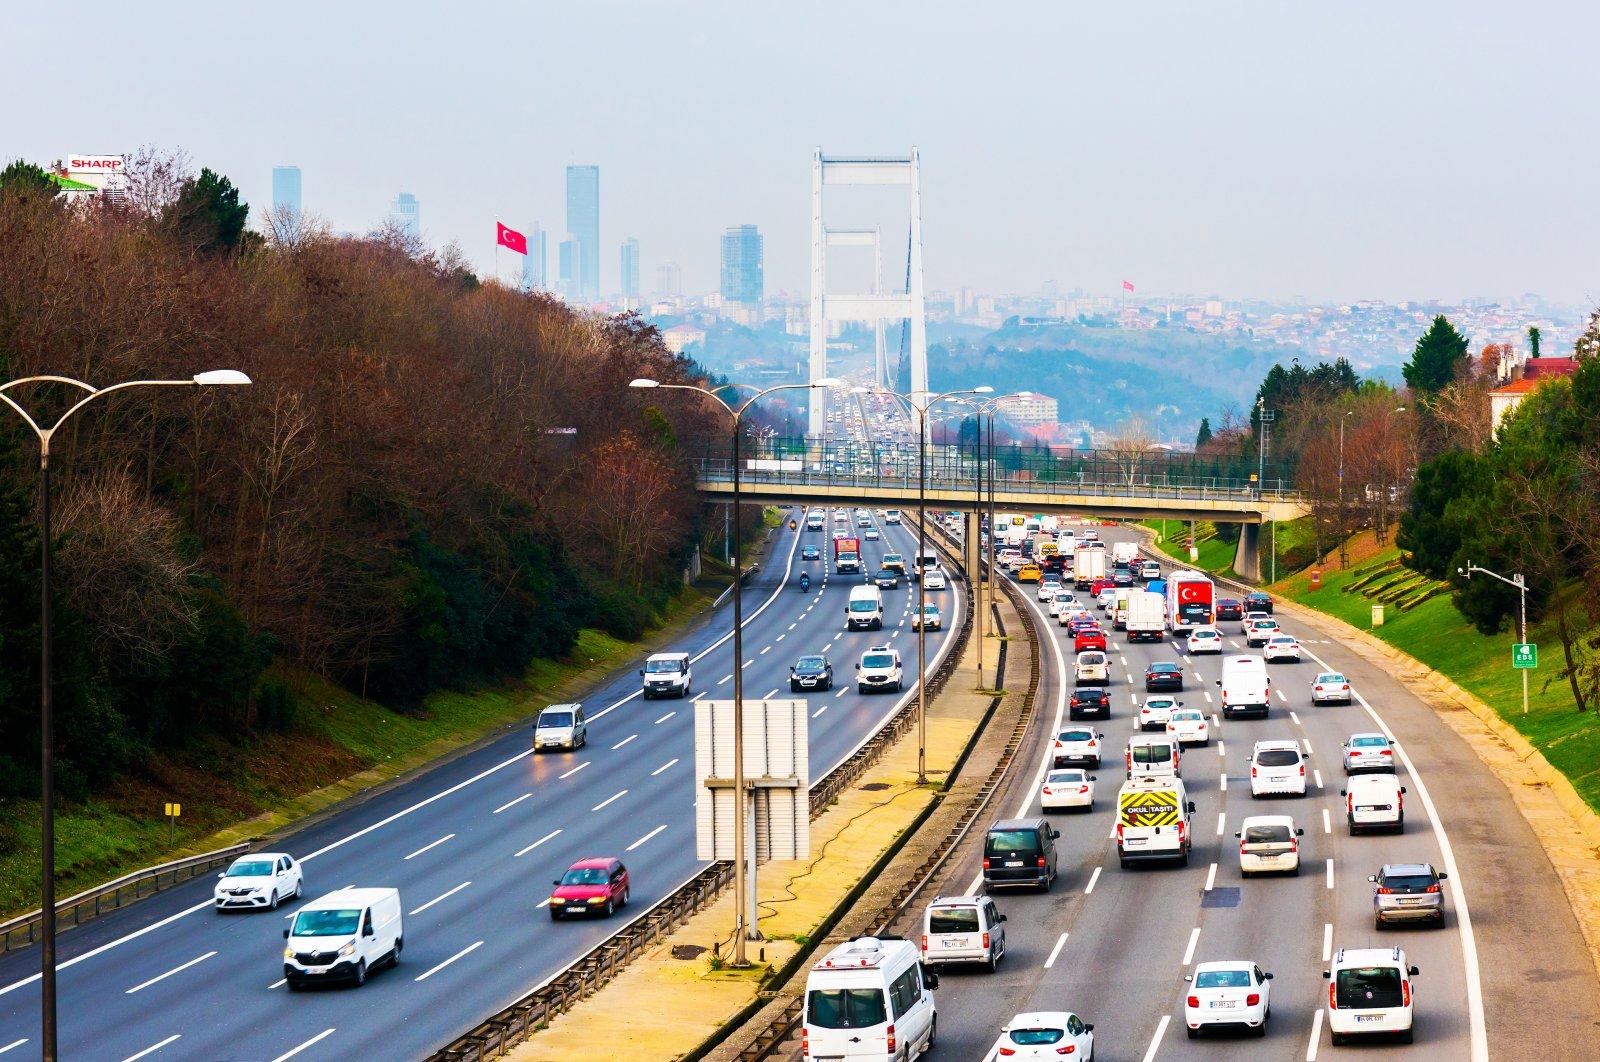 Vehicles seen on a highway connecting the Fatih Sultan Mehmet Bridge, Istanbul, Turkey, Jan. 12, 2021. (Shutterstock Photo)